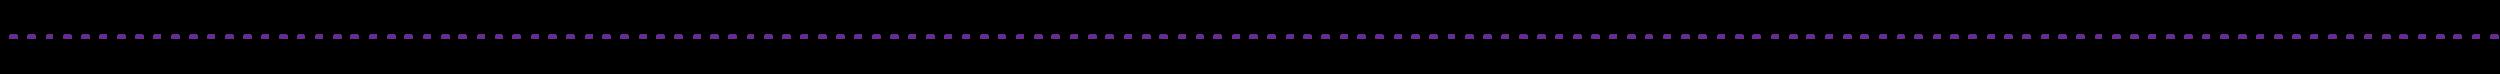 Final_Purple lines.jpg